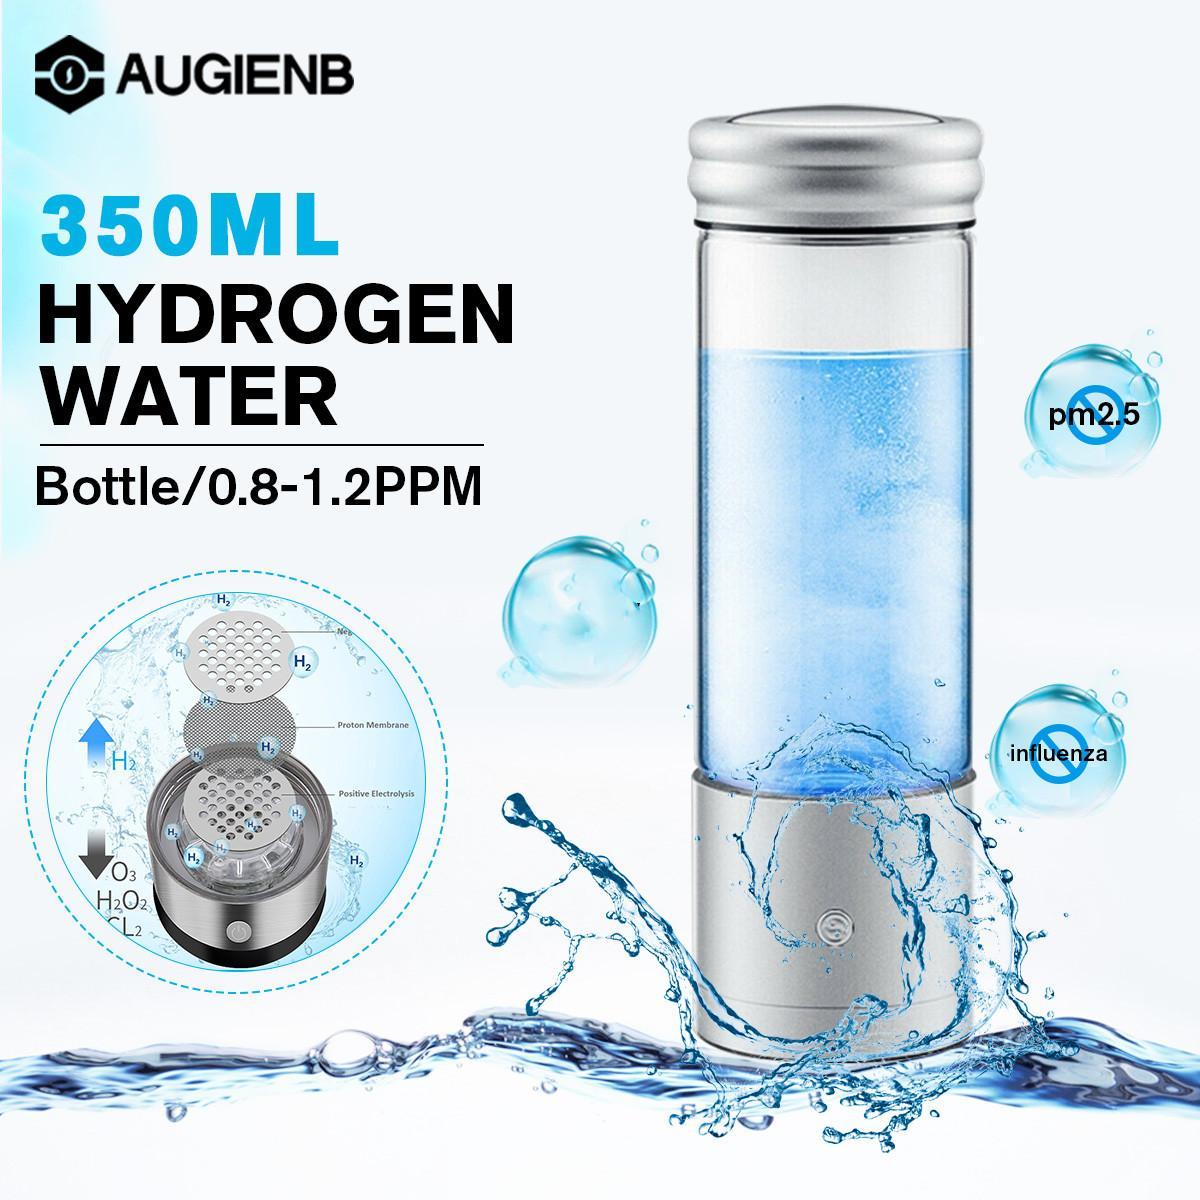 AUGIENB مولد الهيدروجين الغنية التحليل الكهربائي المؤين H2 زجاجة ماء نانو كوب اليابانية الحرفية صغيرة نقية H2 التهوية Rechargeabl